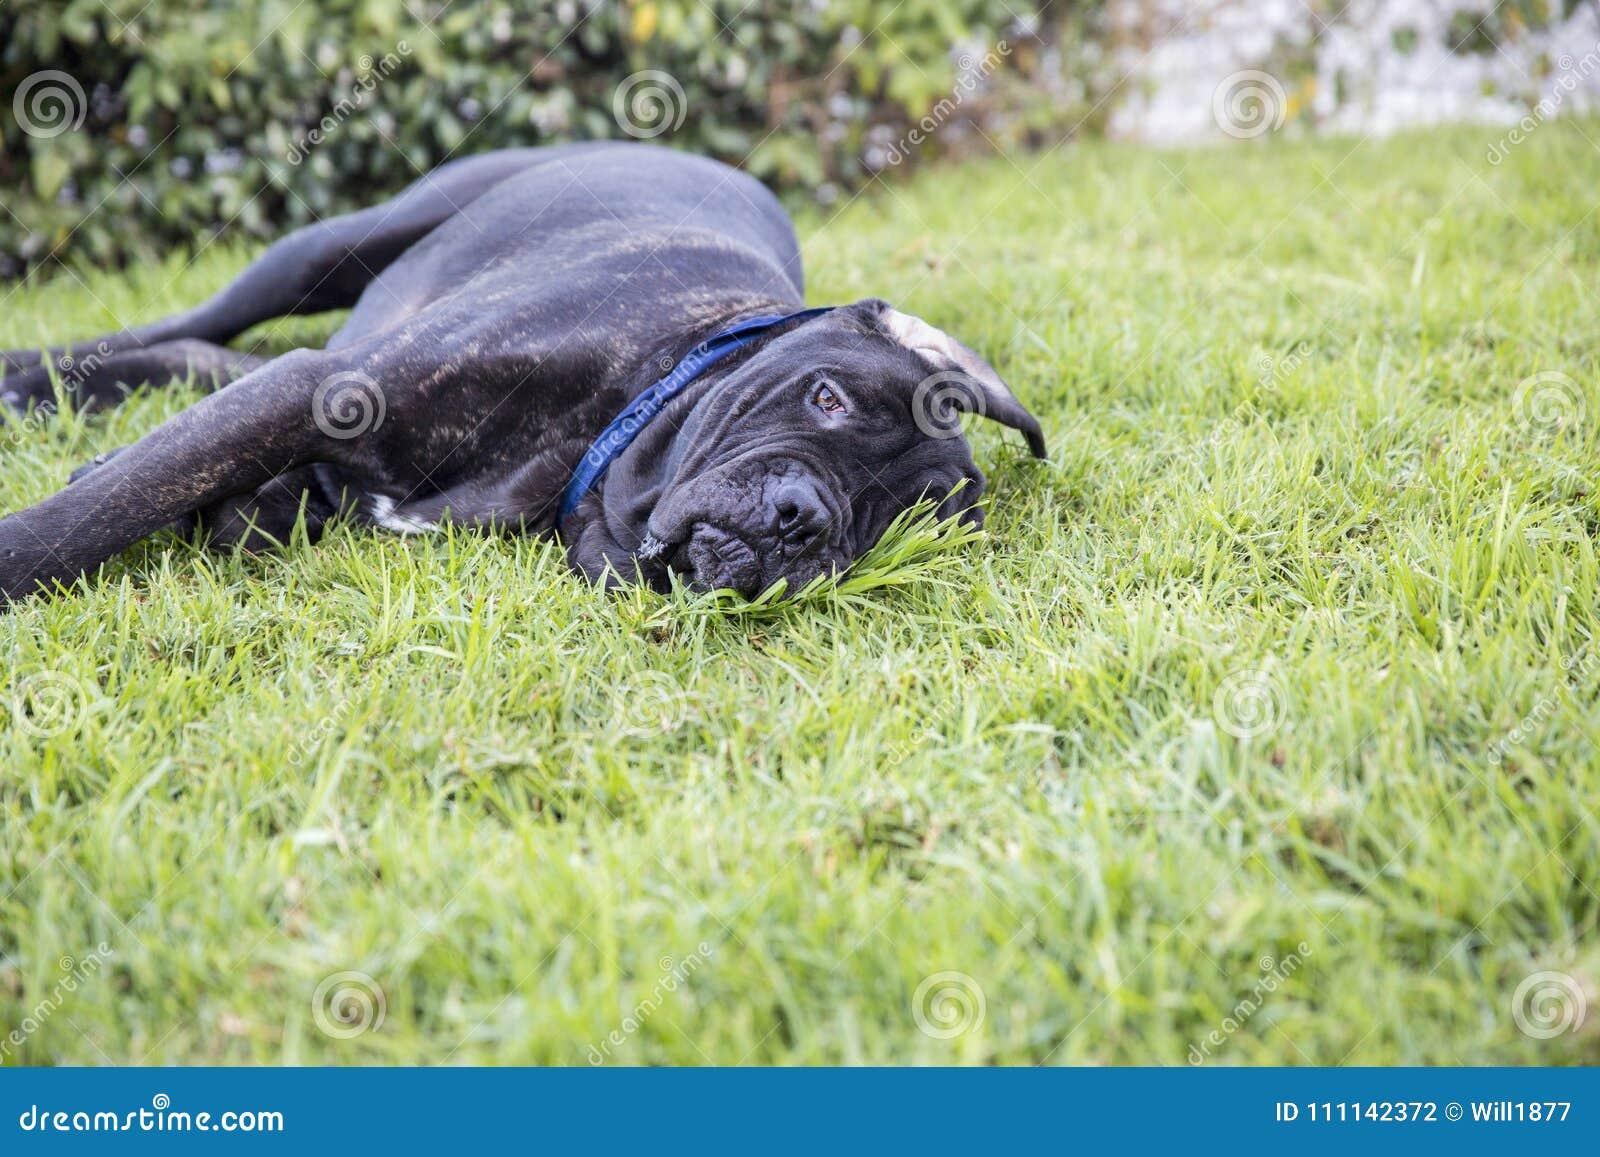 Zwart puppy die op gazon leggen